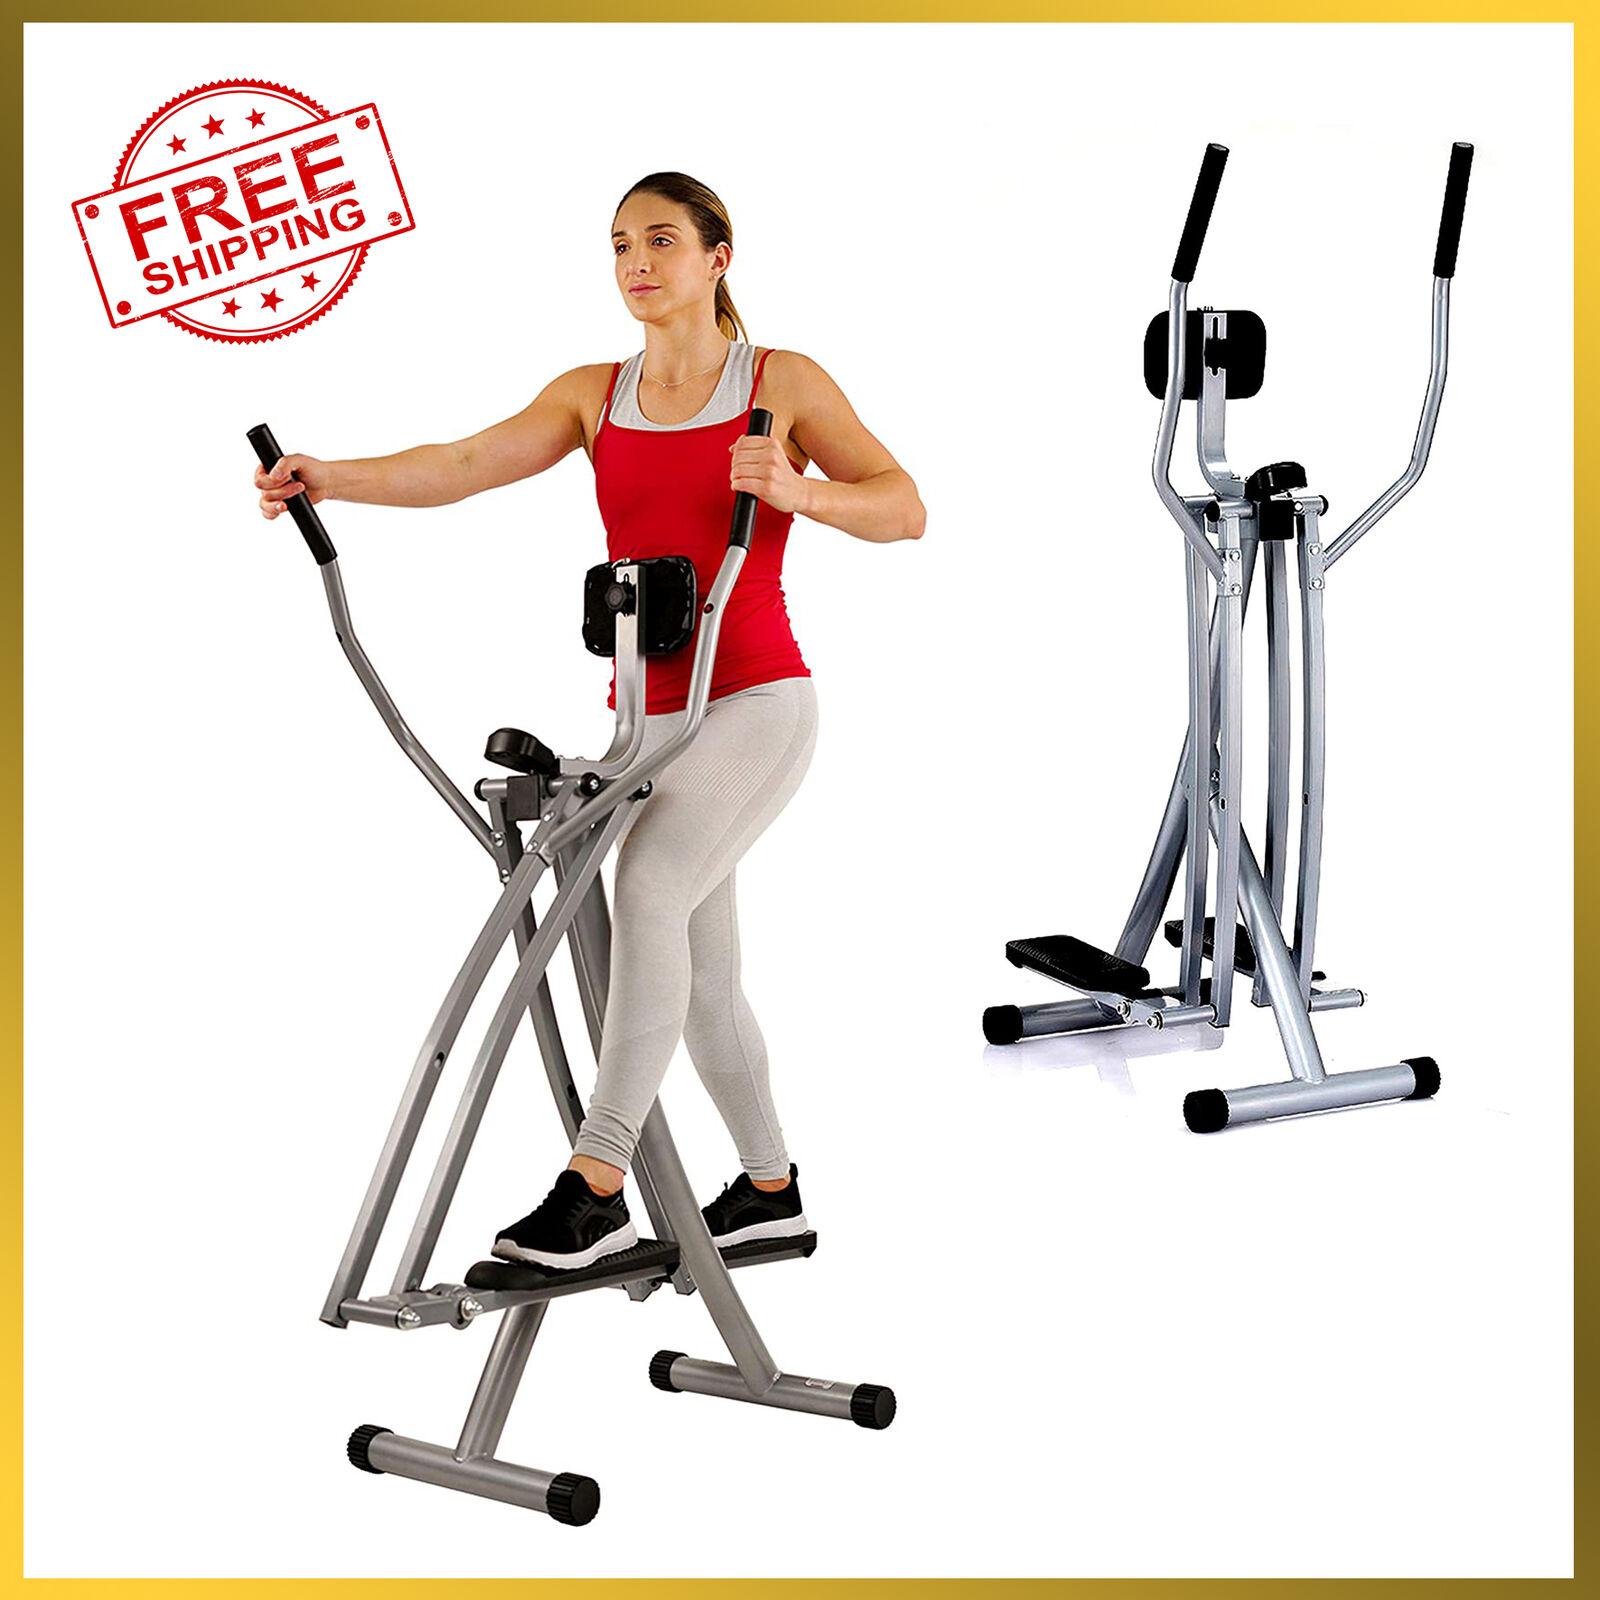 Sunny Health & Fitness SF-E902 Air Walk Trainer Elliptical M